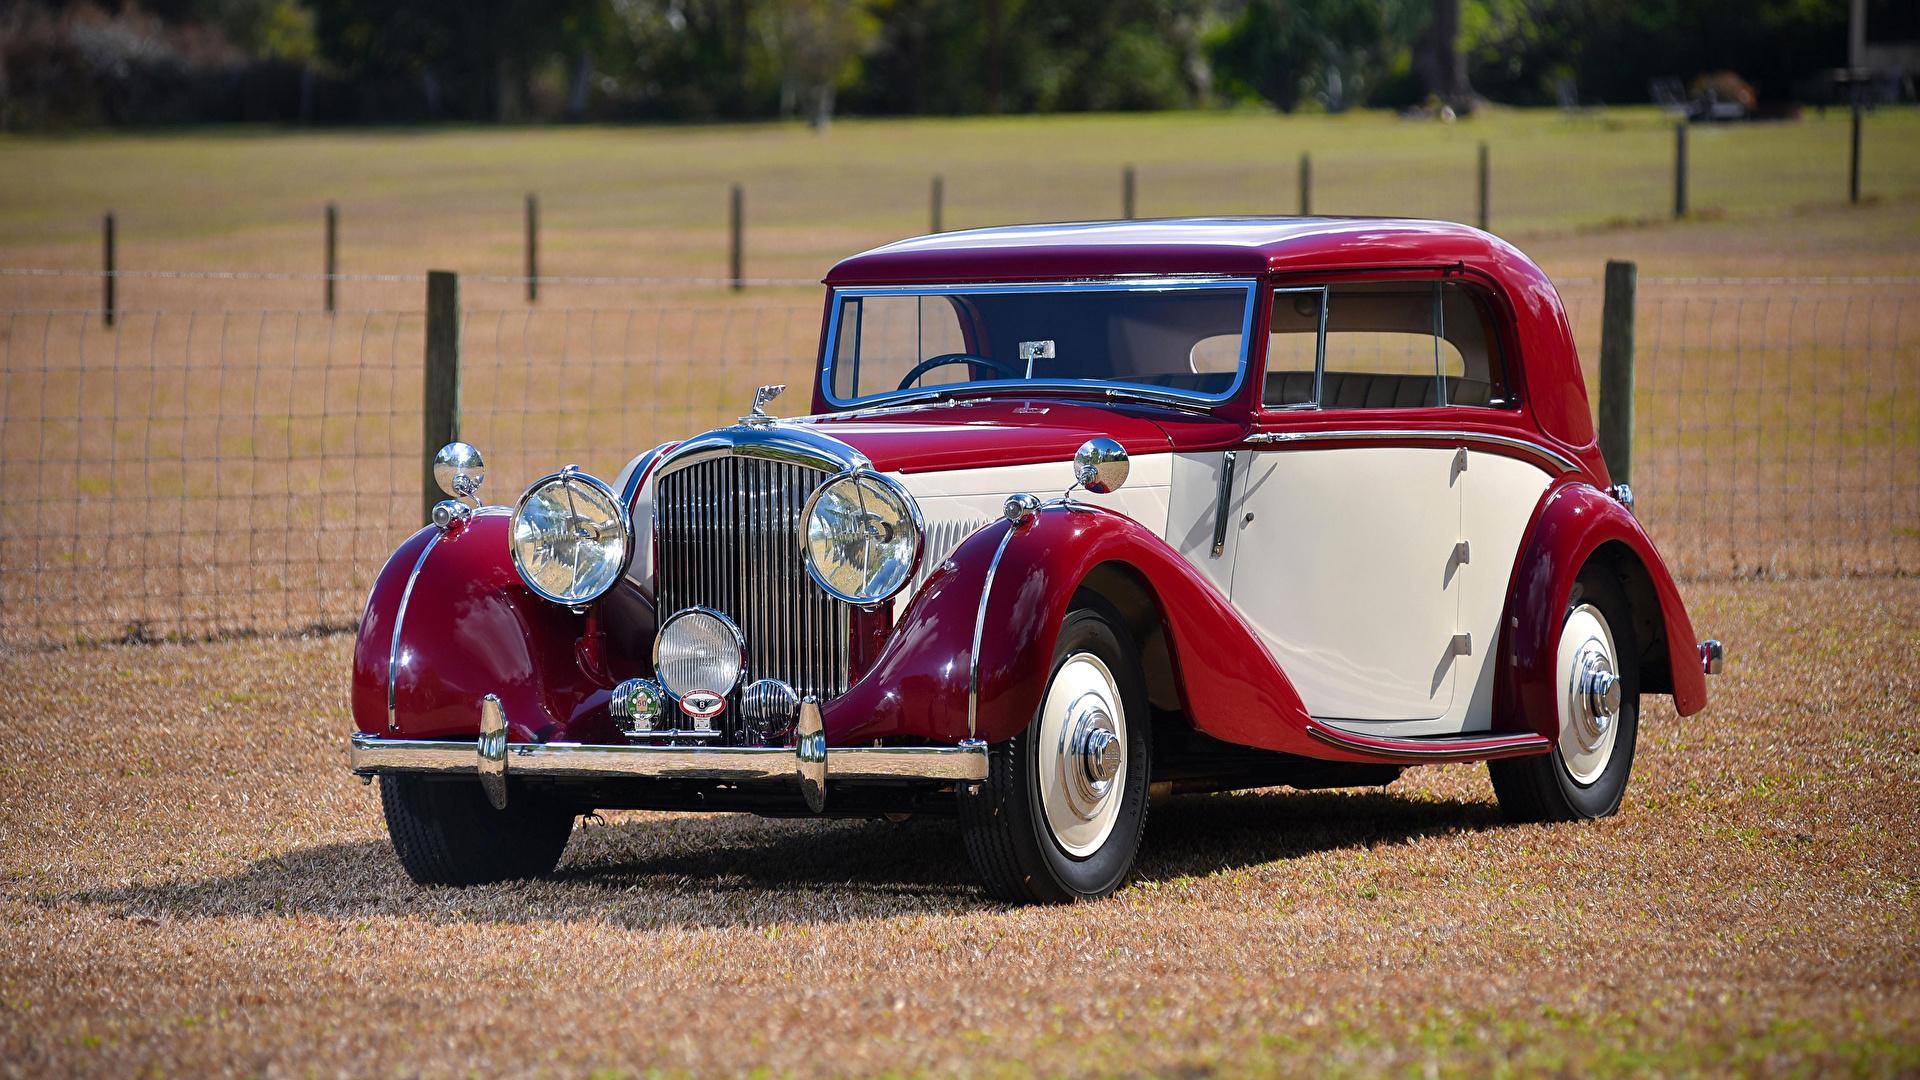 Картинка Бентли 1939 4 ¼ Litre Coupe by Park Ward винтаж Металлик Автомобили 1920x1080 Bentley Ретро старинные авто машины машина автомобиль